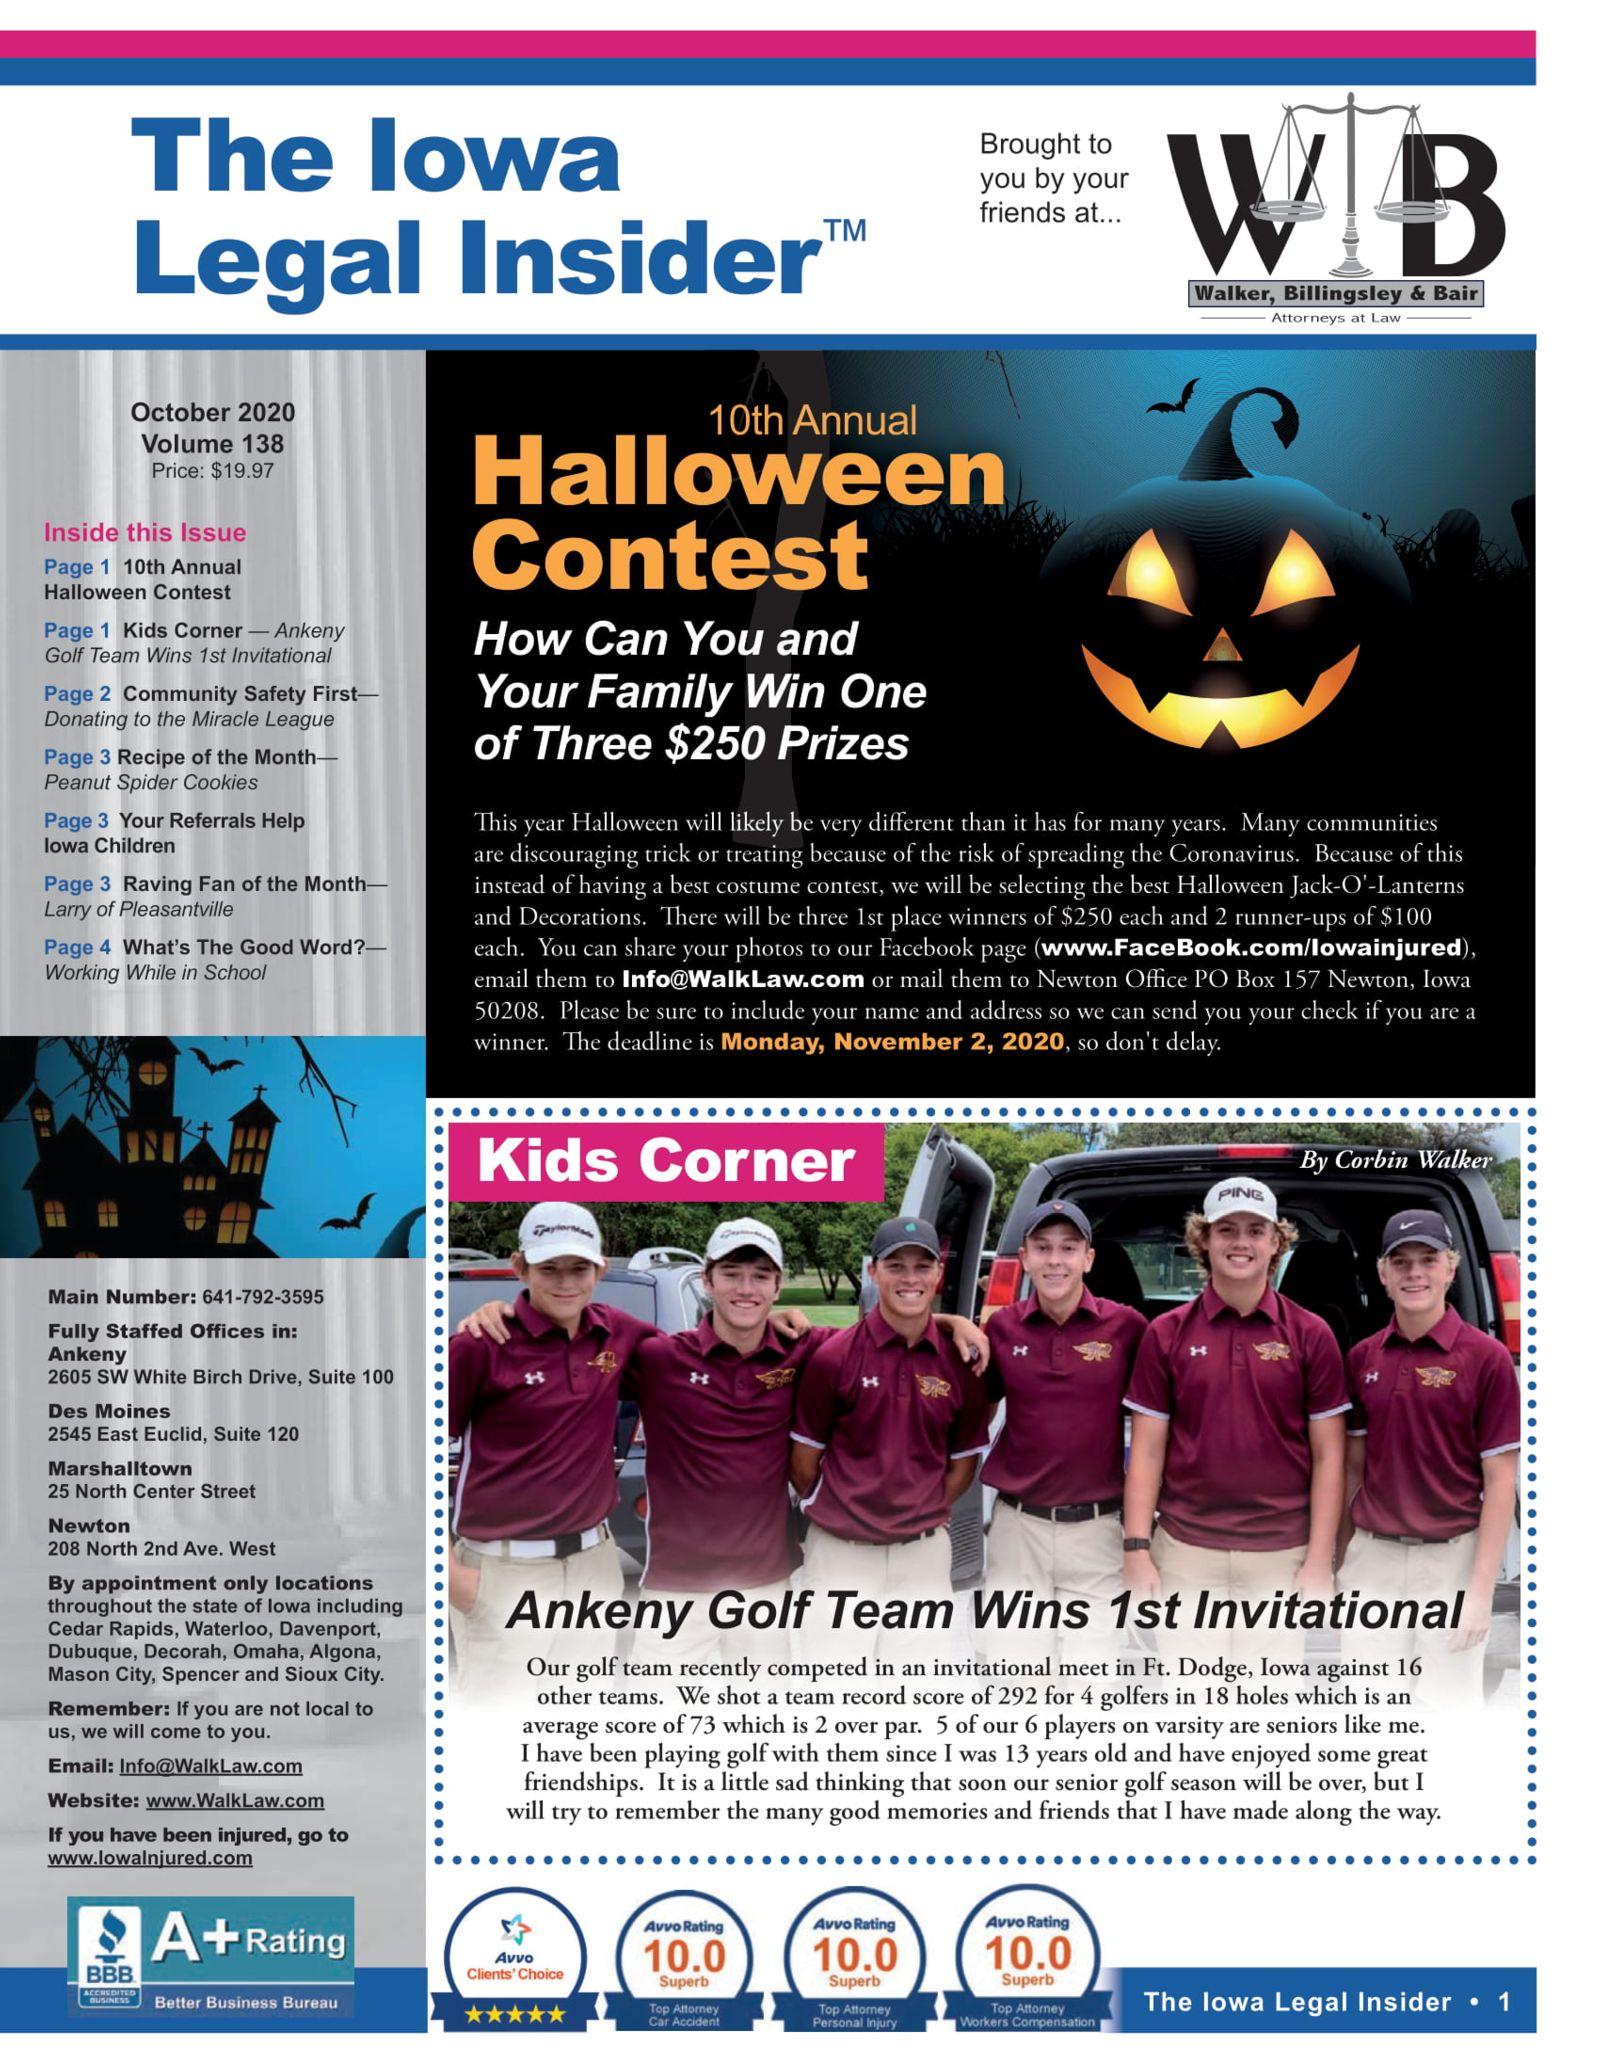 Iowa legal insider Halloween costume contest